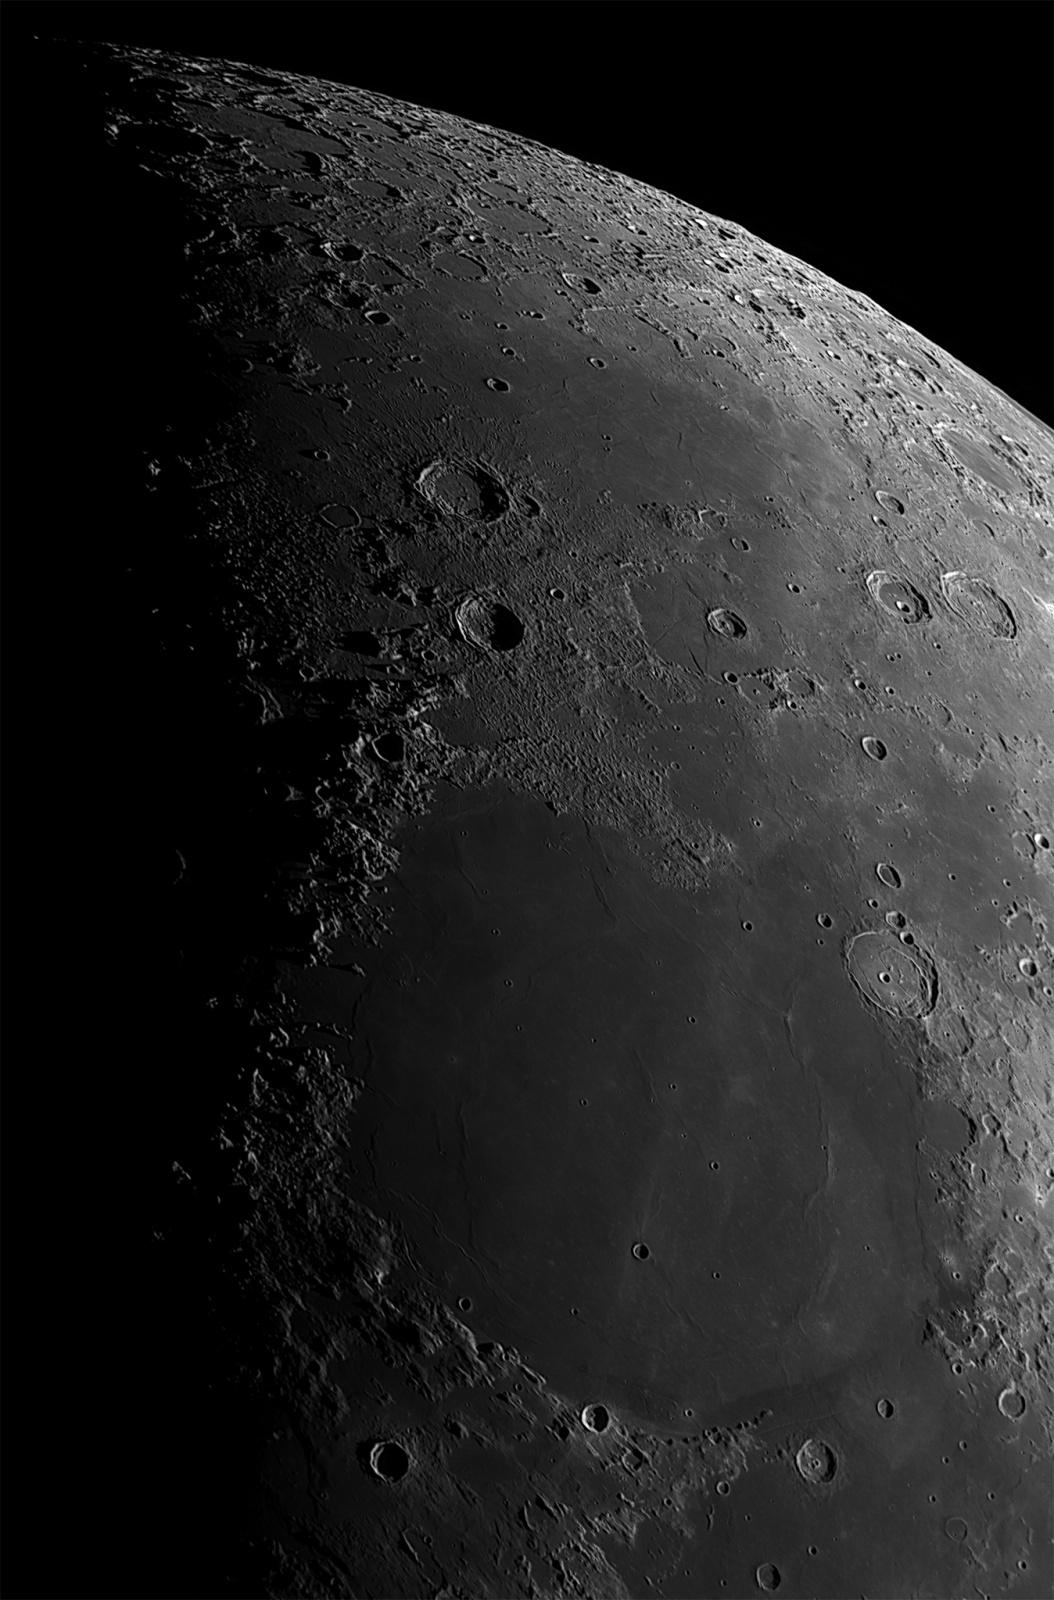 2021-03-20-1959_2-U-L-Moon_c8_L_north_lapl3_ap296_conv_regi_ps_FB.jpg